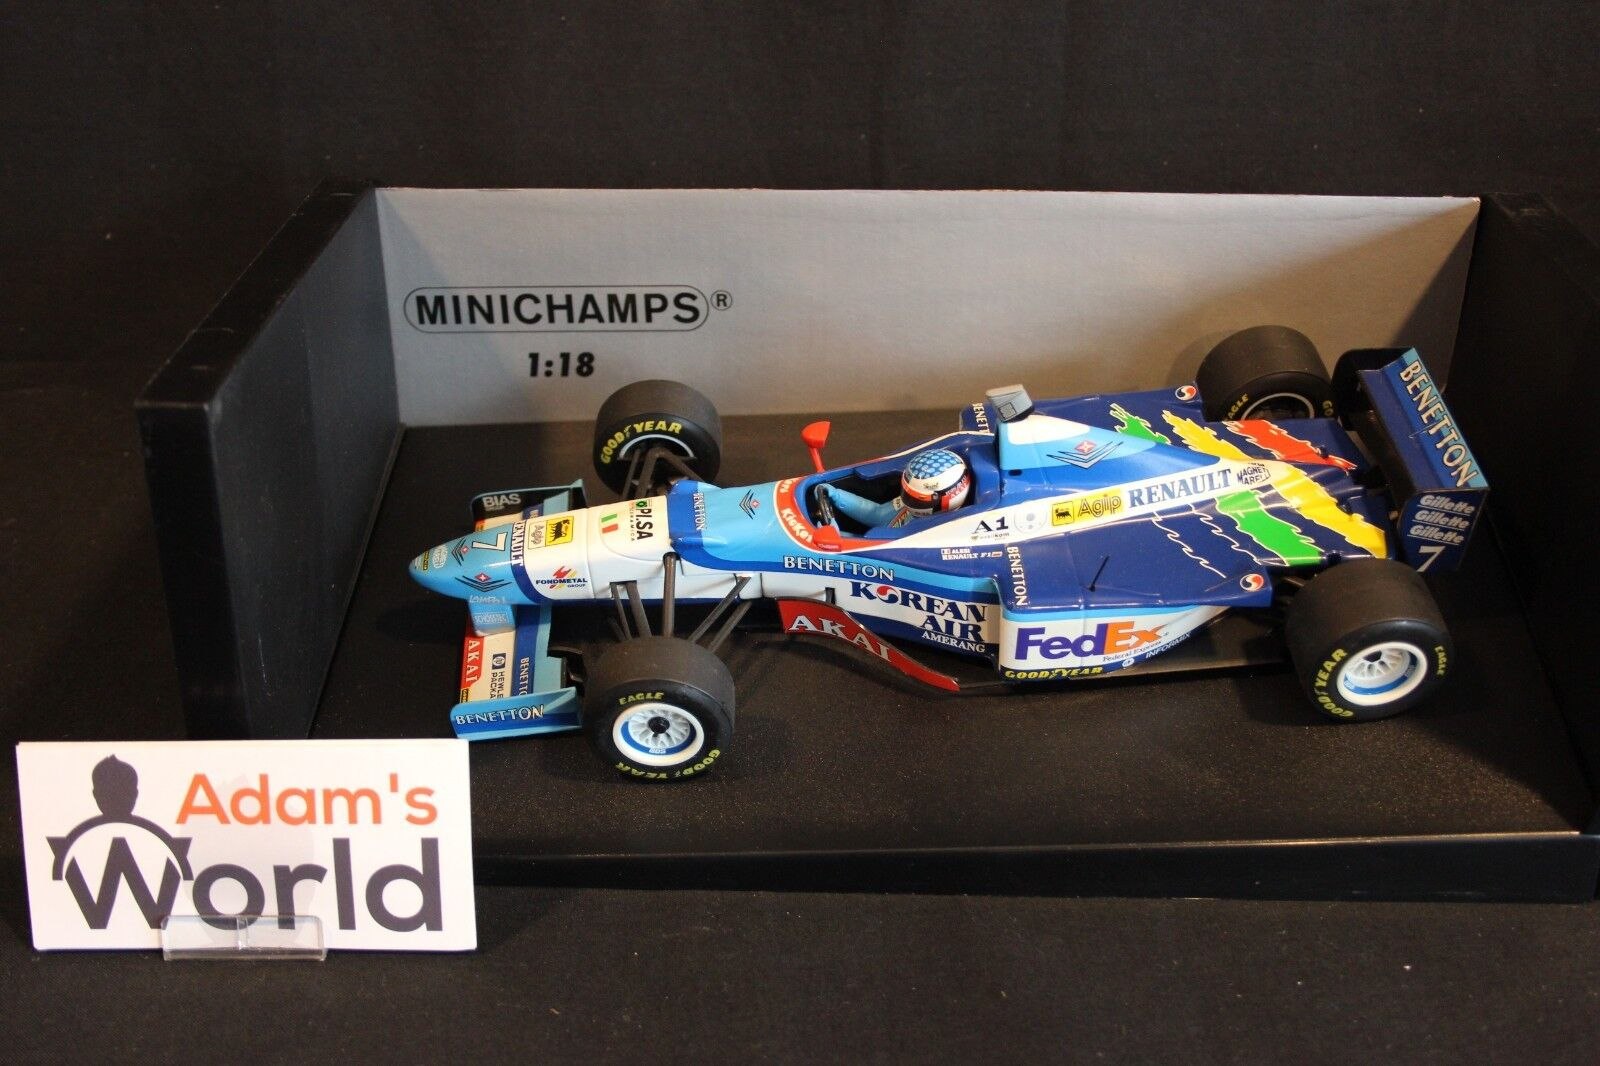 Minichamps Benetton Renault B197 1997 1 18 Jean Alesi (FRA) (MM1)